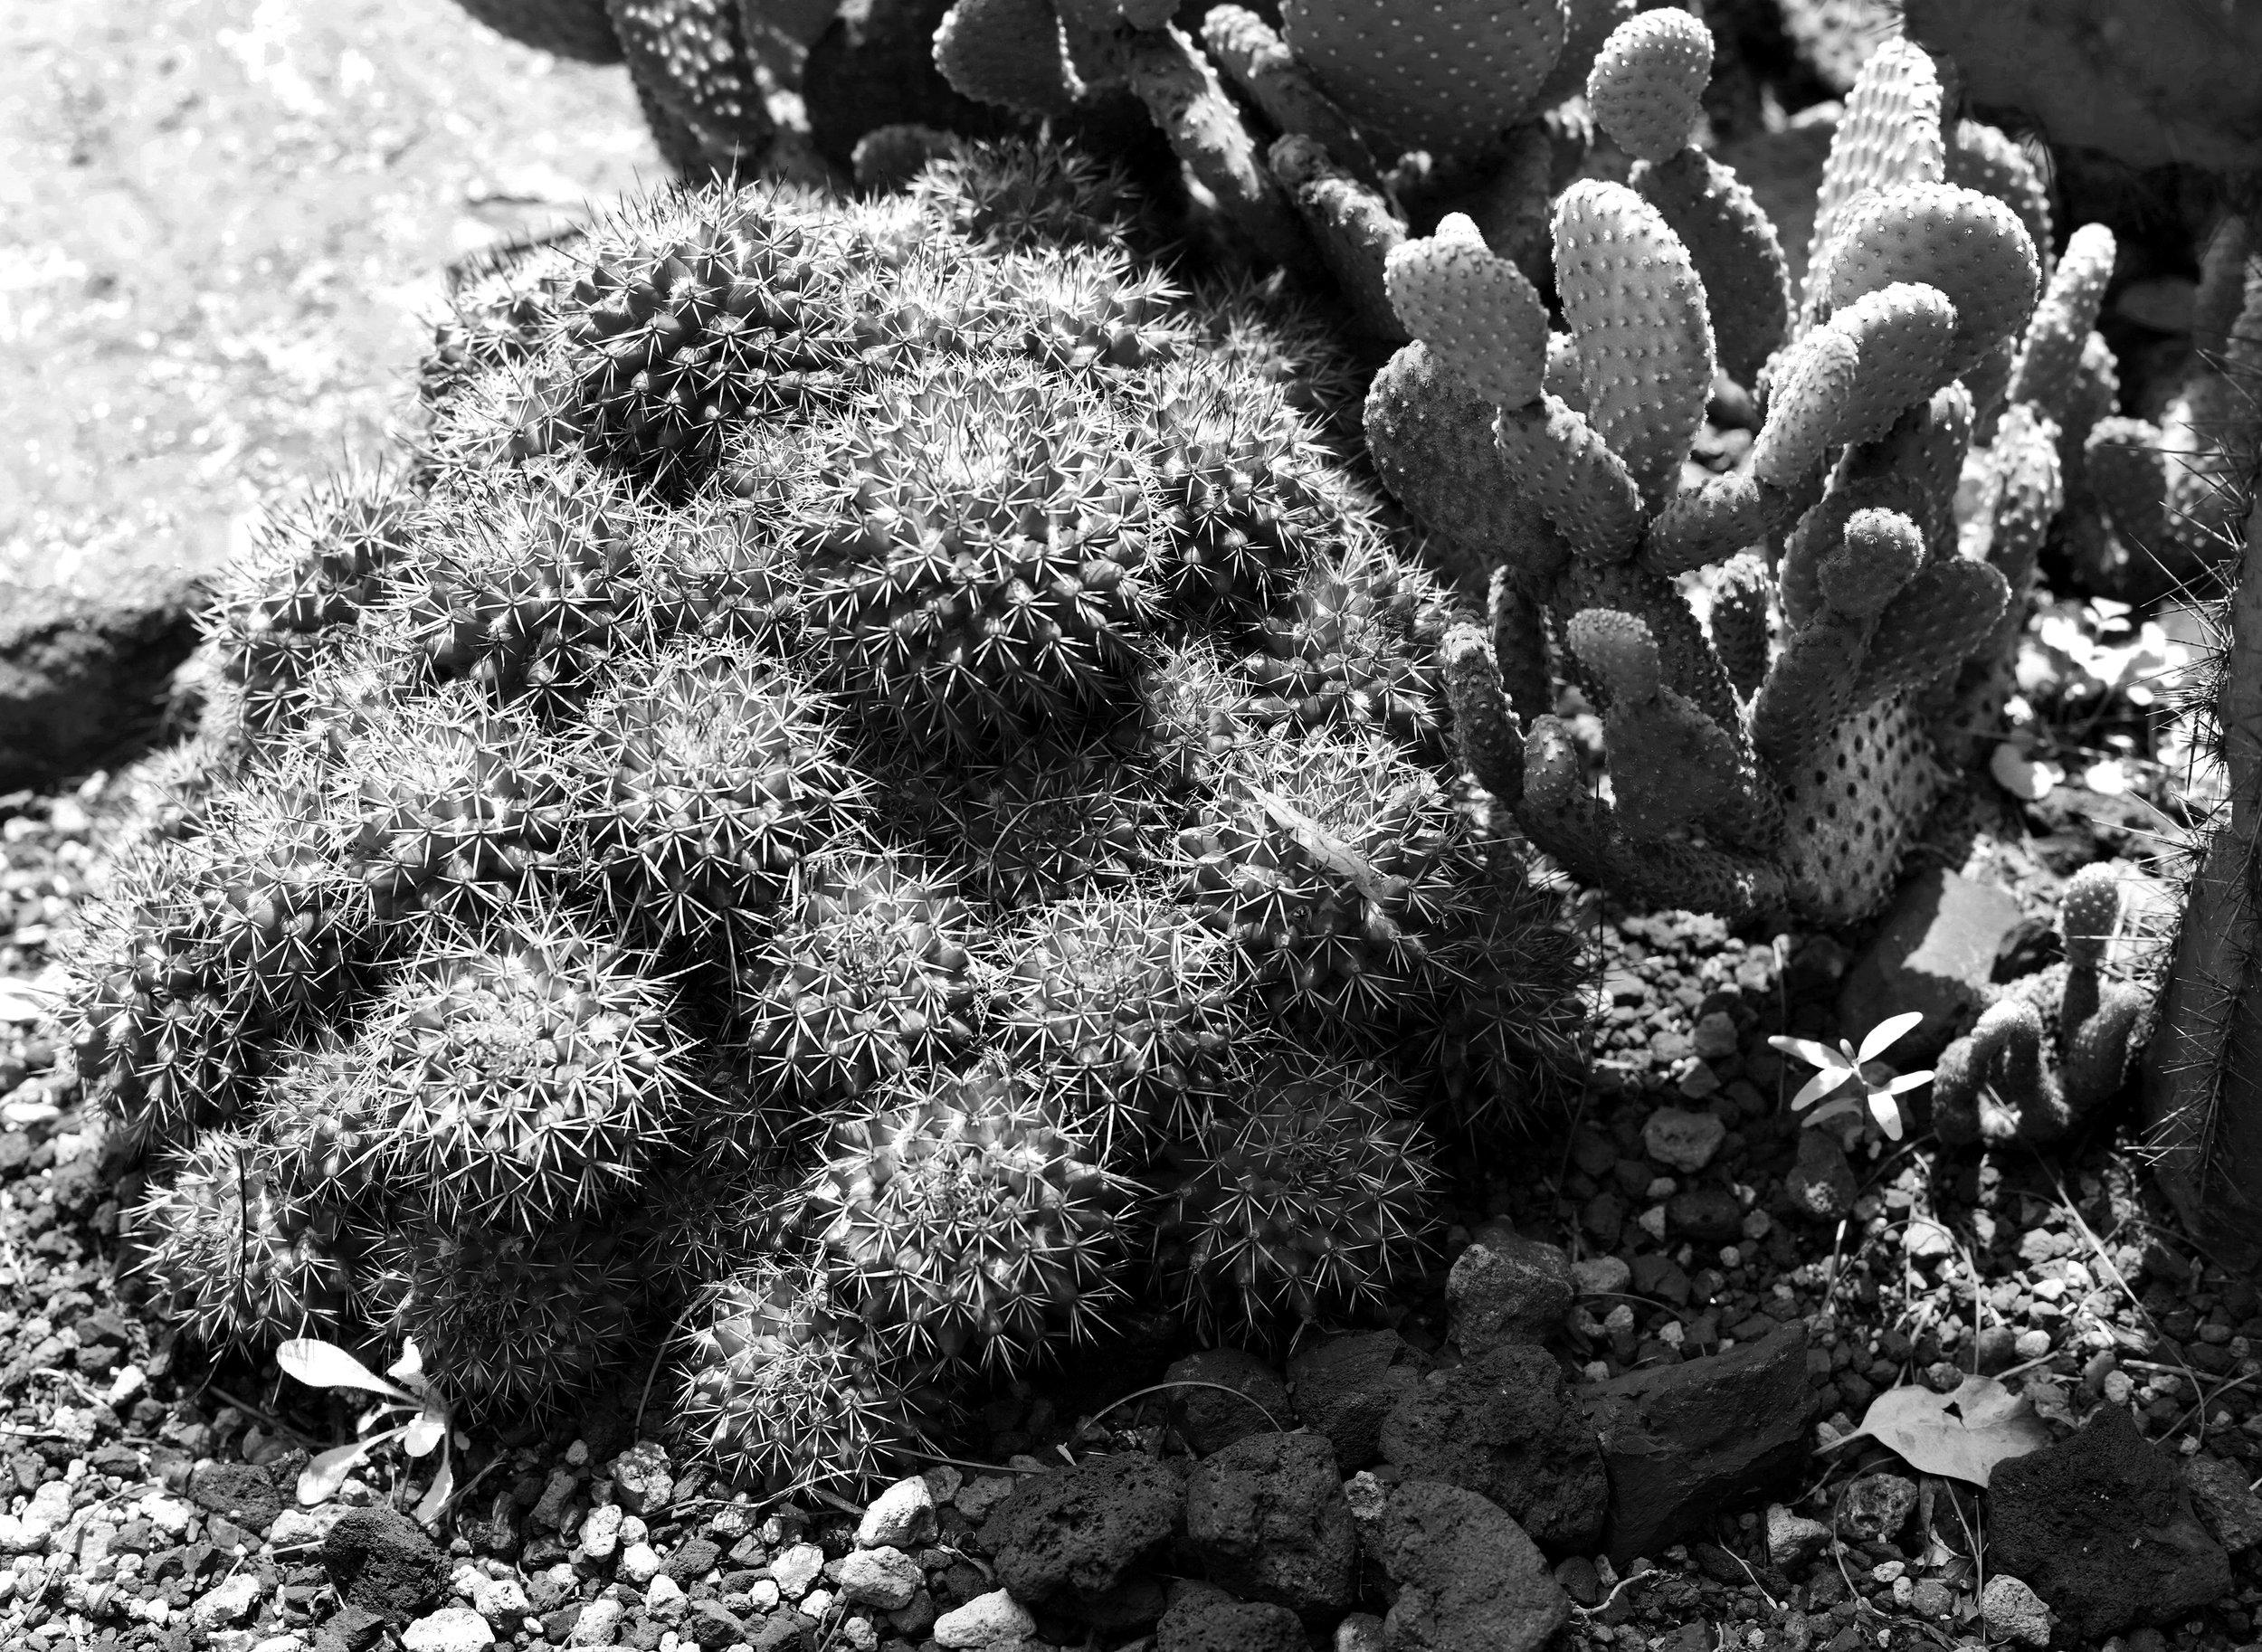 Cactus Garden, Black & White